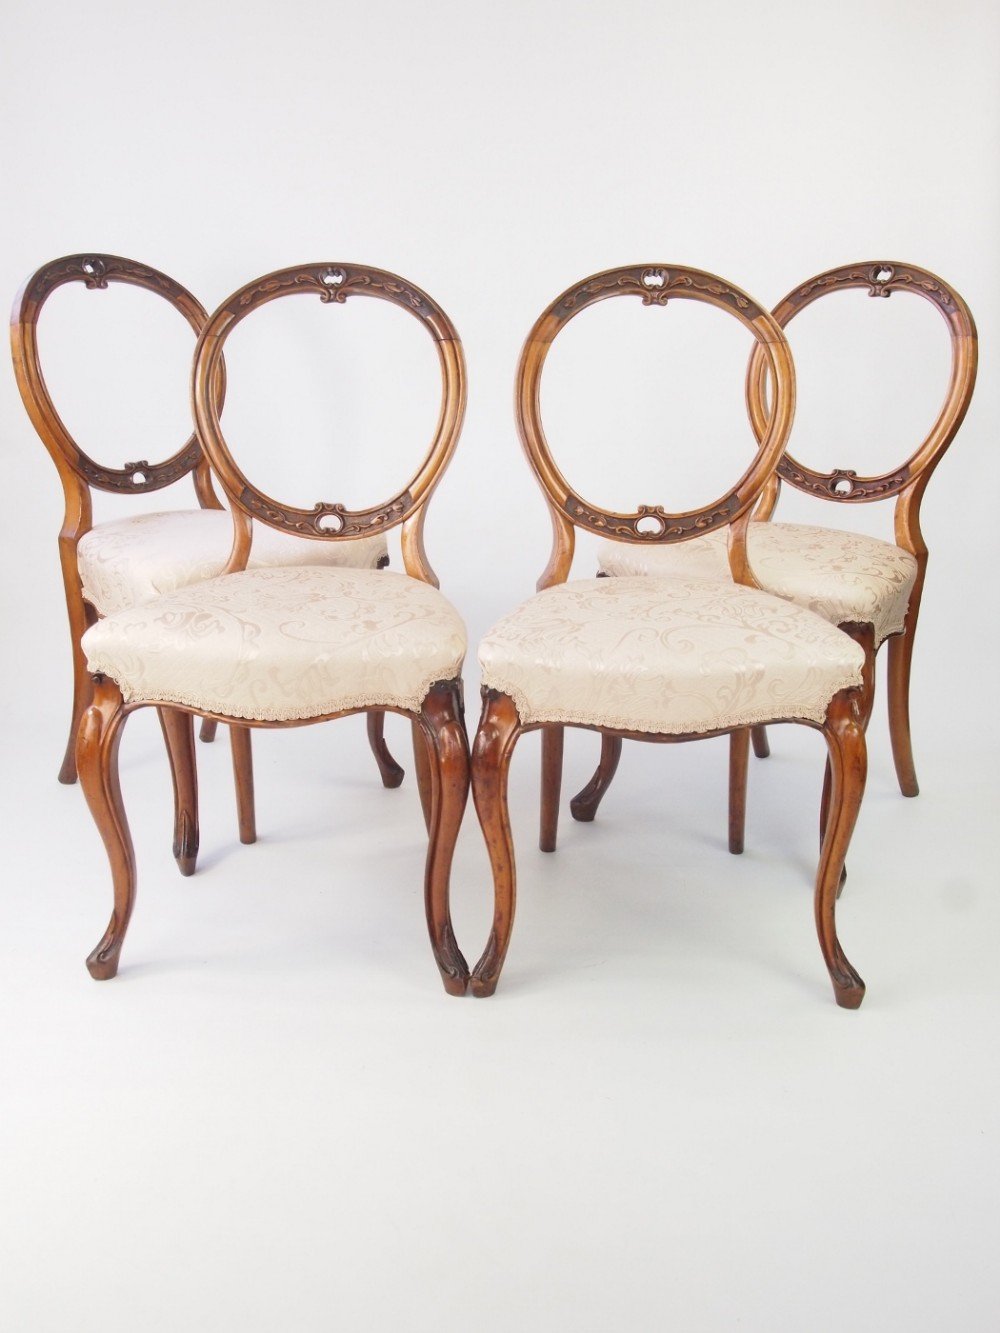 set 4 victorian walnut balloon back chairs - Set 4 Victorian Walnut Balloon Back Chairs 330107